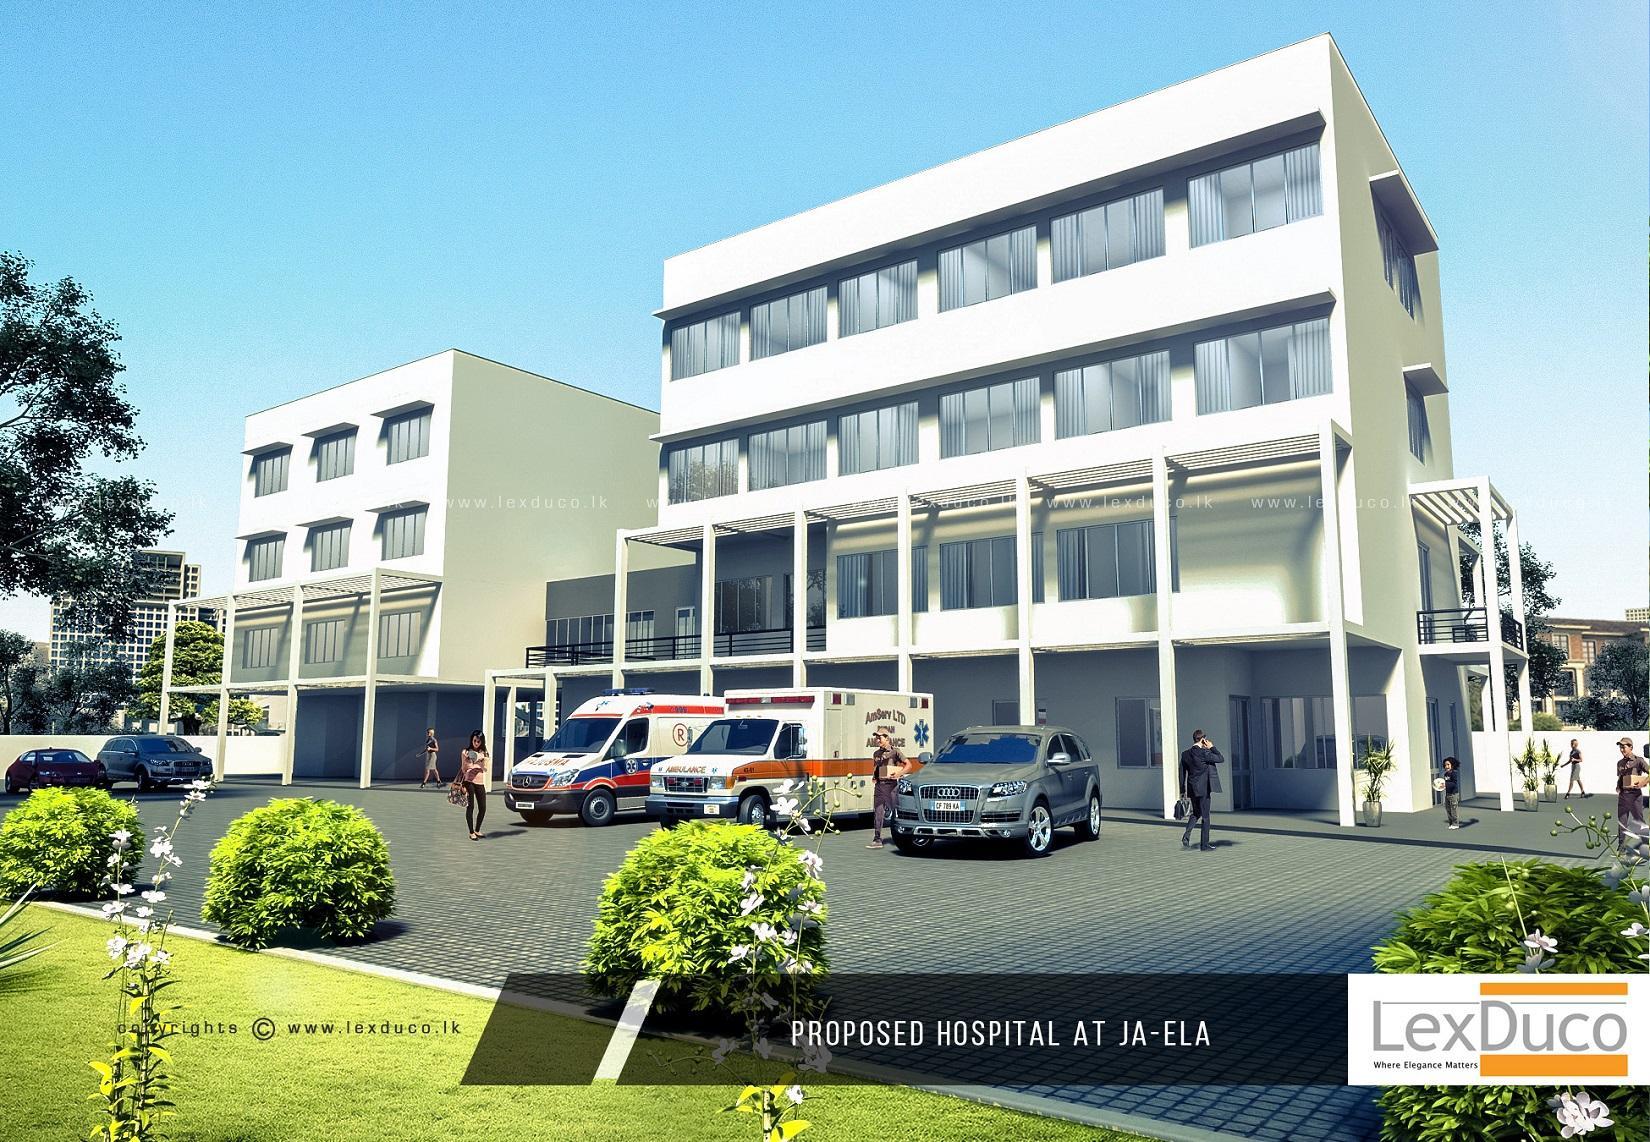 Hospital at Ja-Ela | Lex Duco